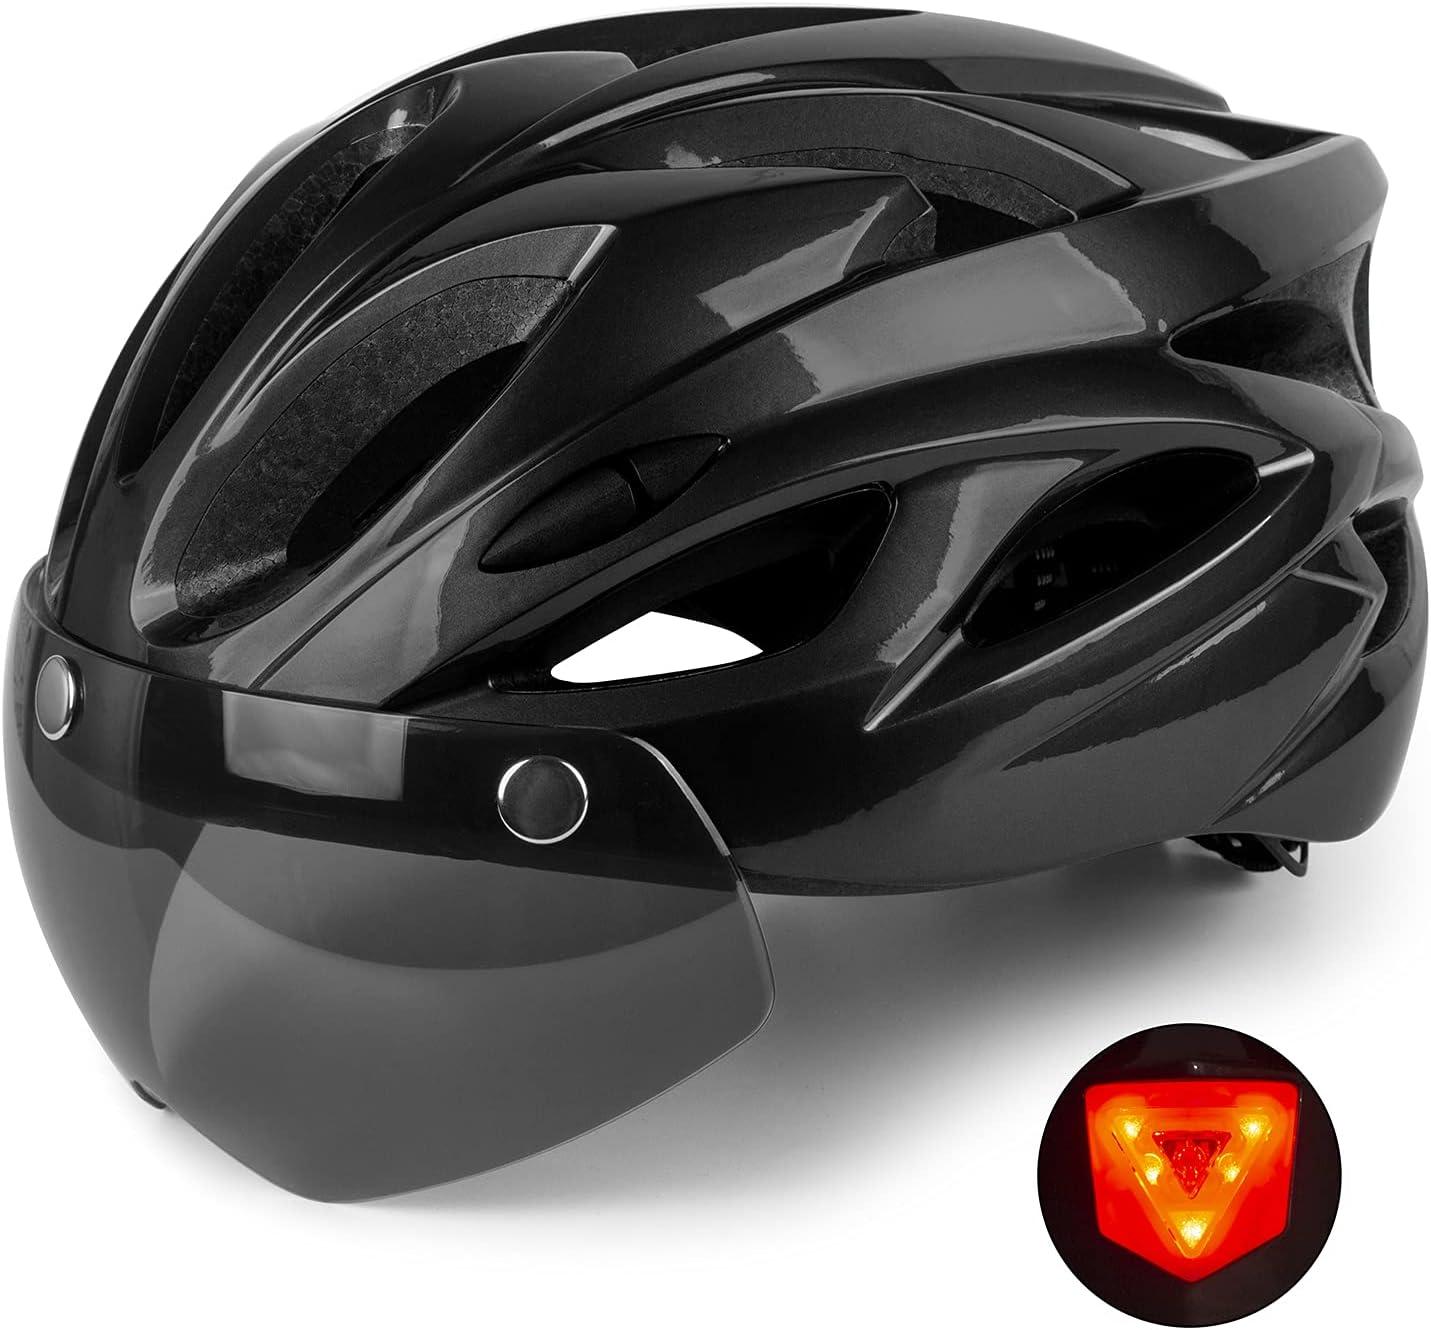 Shinmax Casco Bicicleta con luz, Certificación CE,con Visera Magnética Seguridad Ajustable Desmontable Deporte Gafas de Protección Ligera para Montar Ski & Snowboard Unisex Cascos Bici Adultos 56-